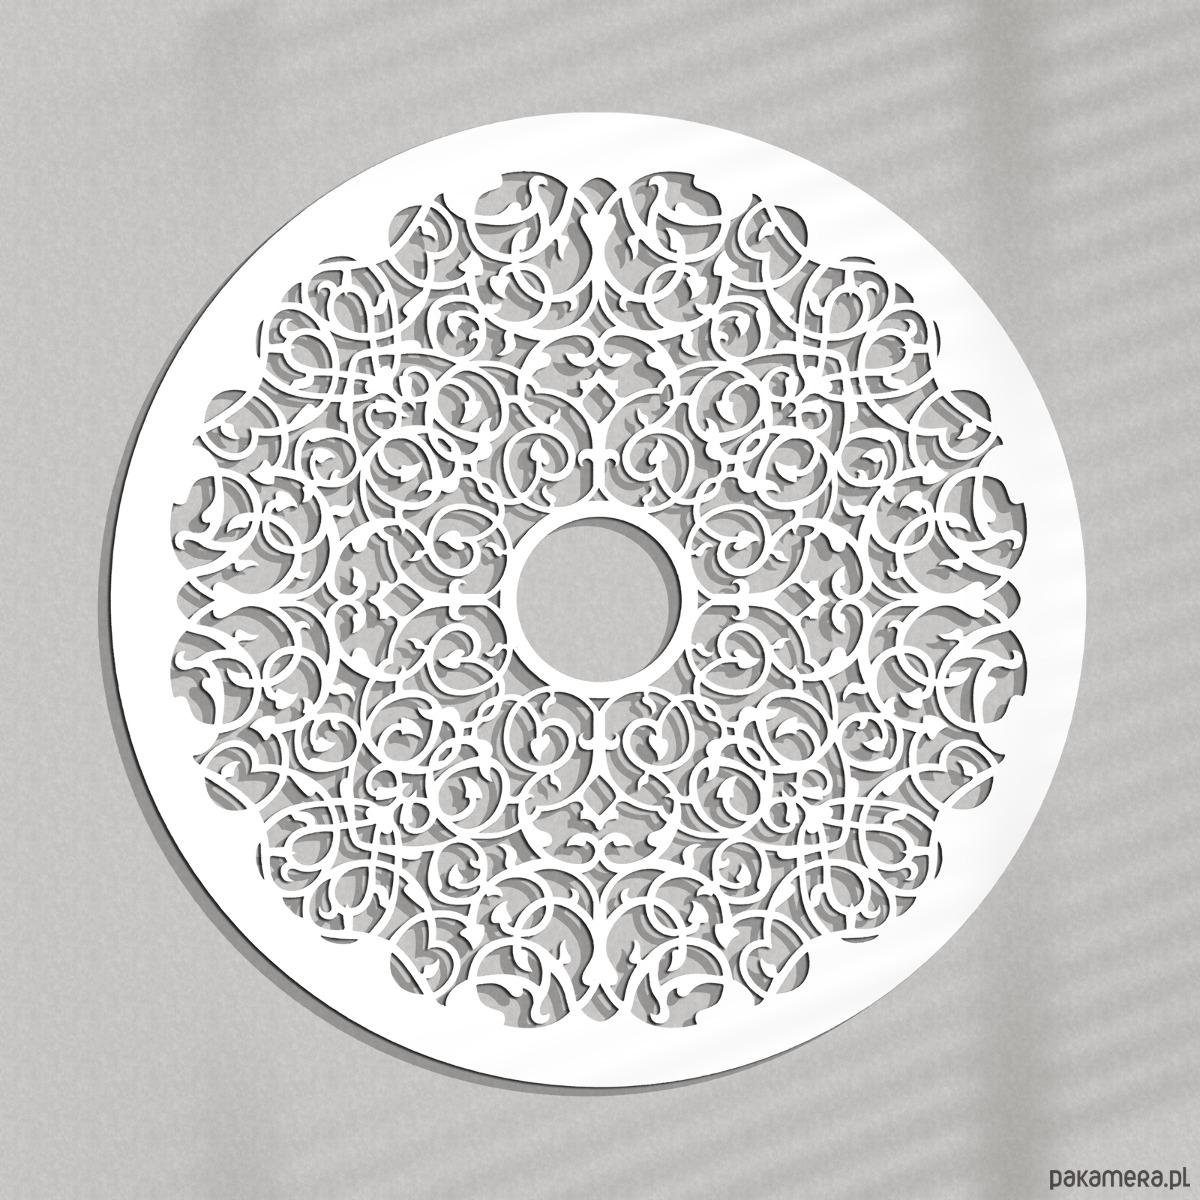 Ażurowa Dekoracja ścienna Arabesque 60 Cm Pakamerapl